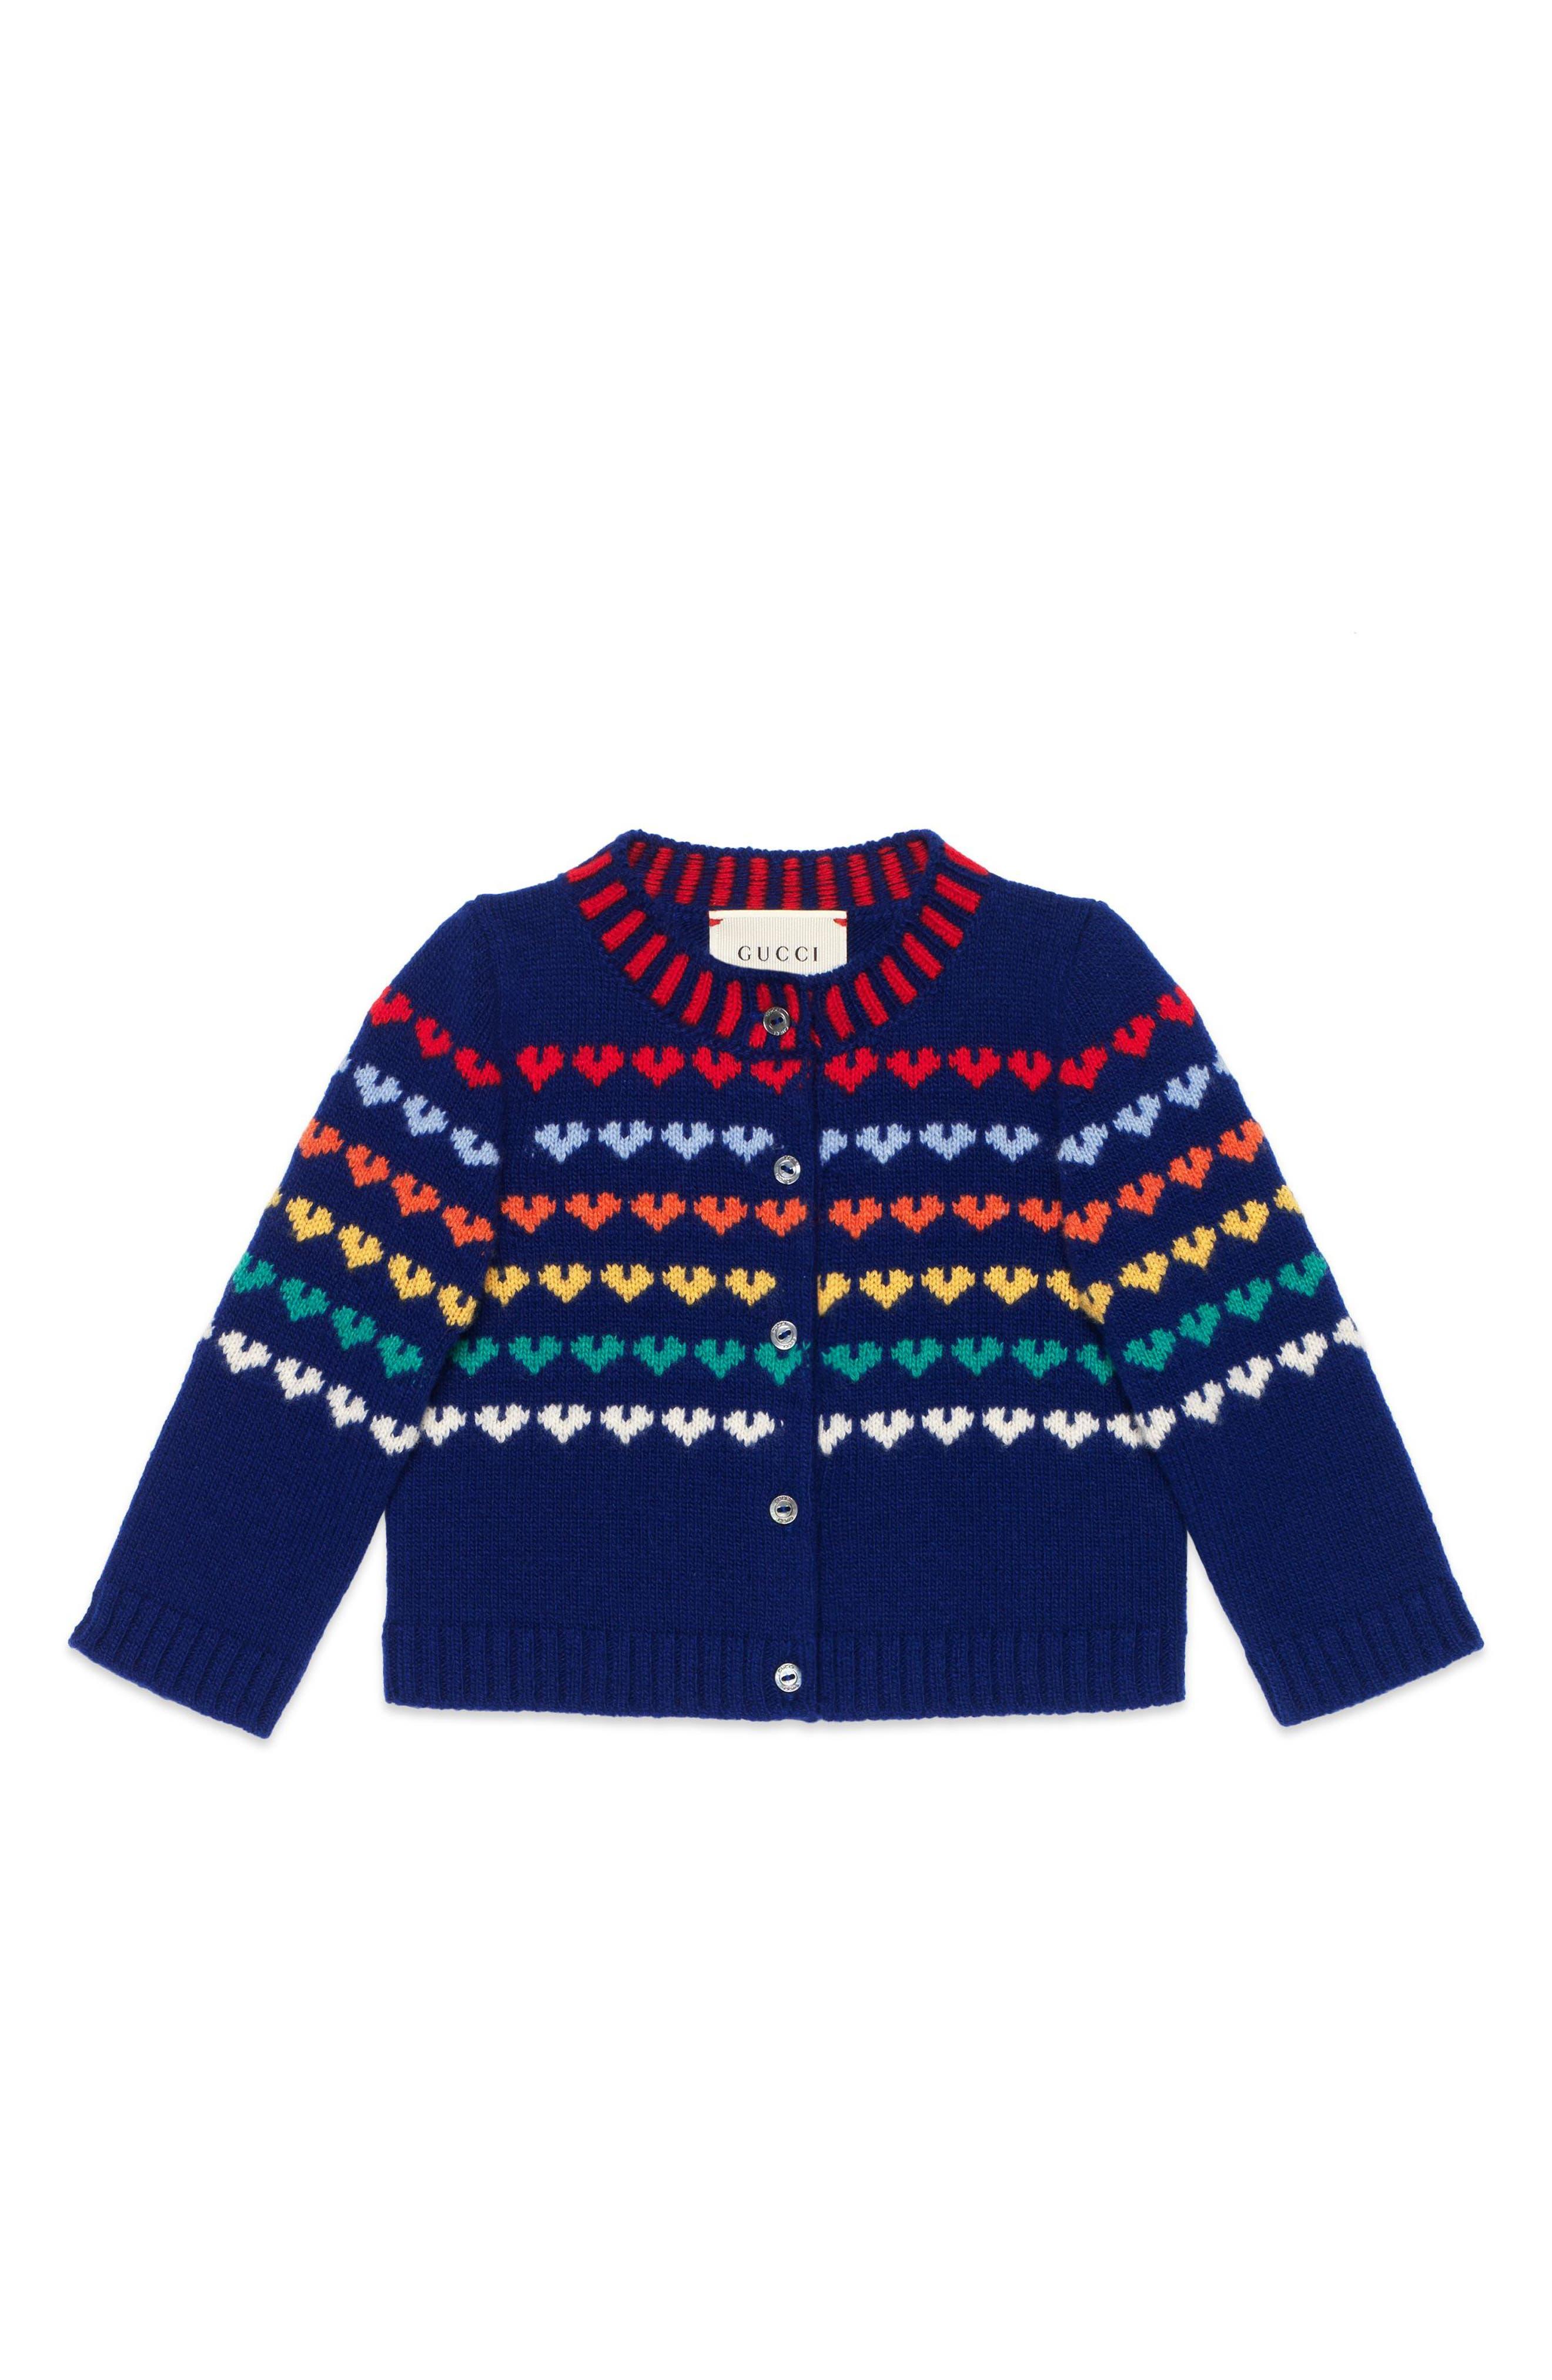 Gucci Logo Wool & Cashmere Cardigan (Baby Girls)